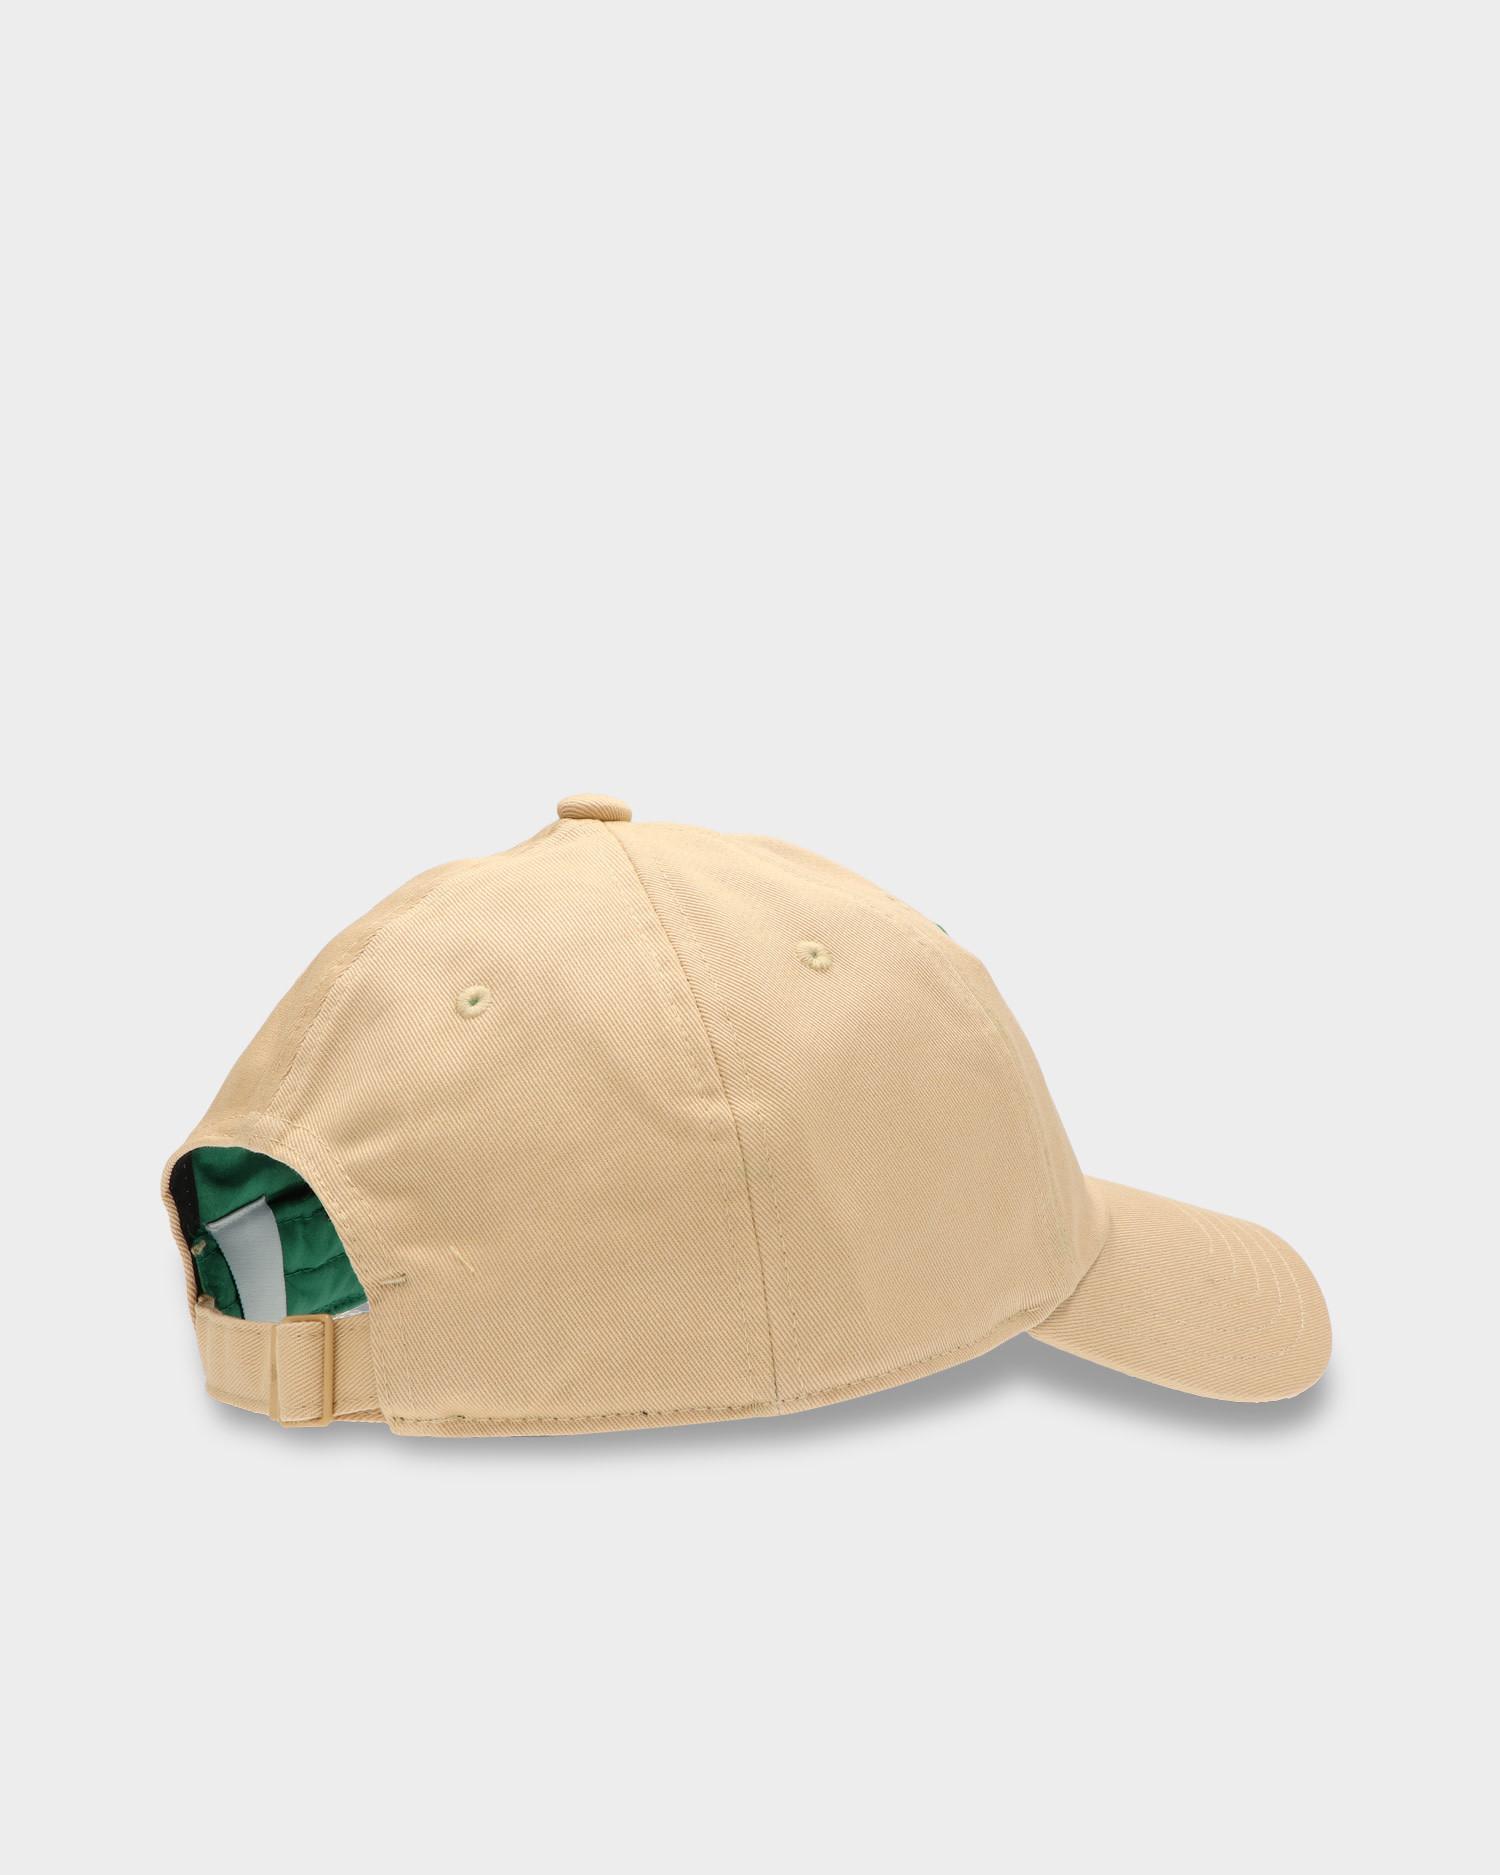 Adidas Not Easy Being Green Dad Cap Hazy Beige/Bold Green